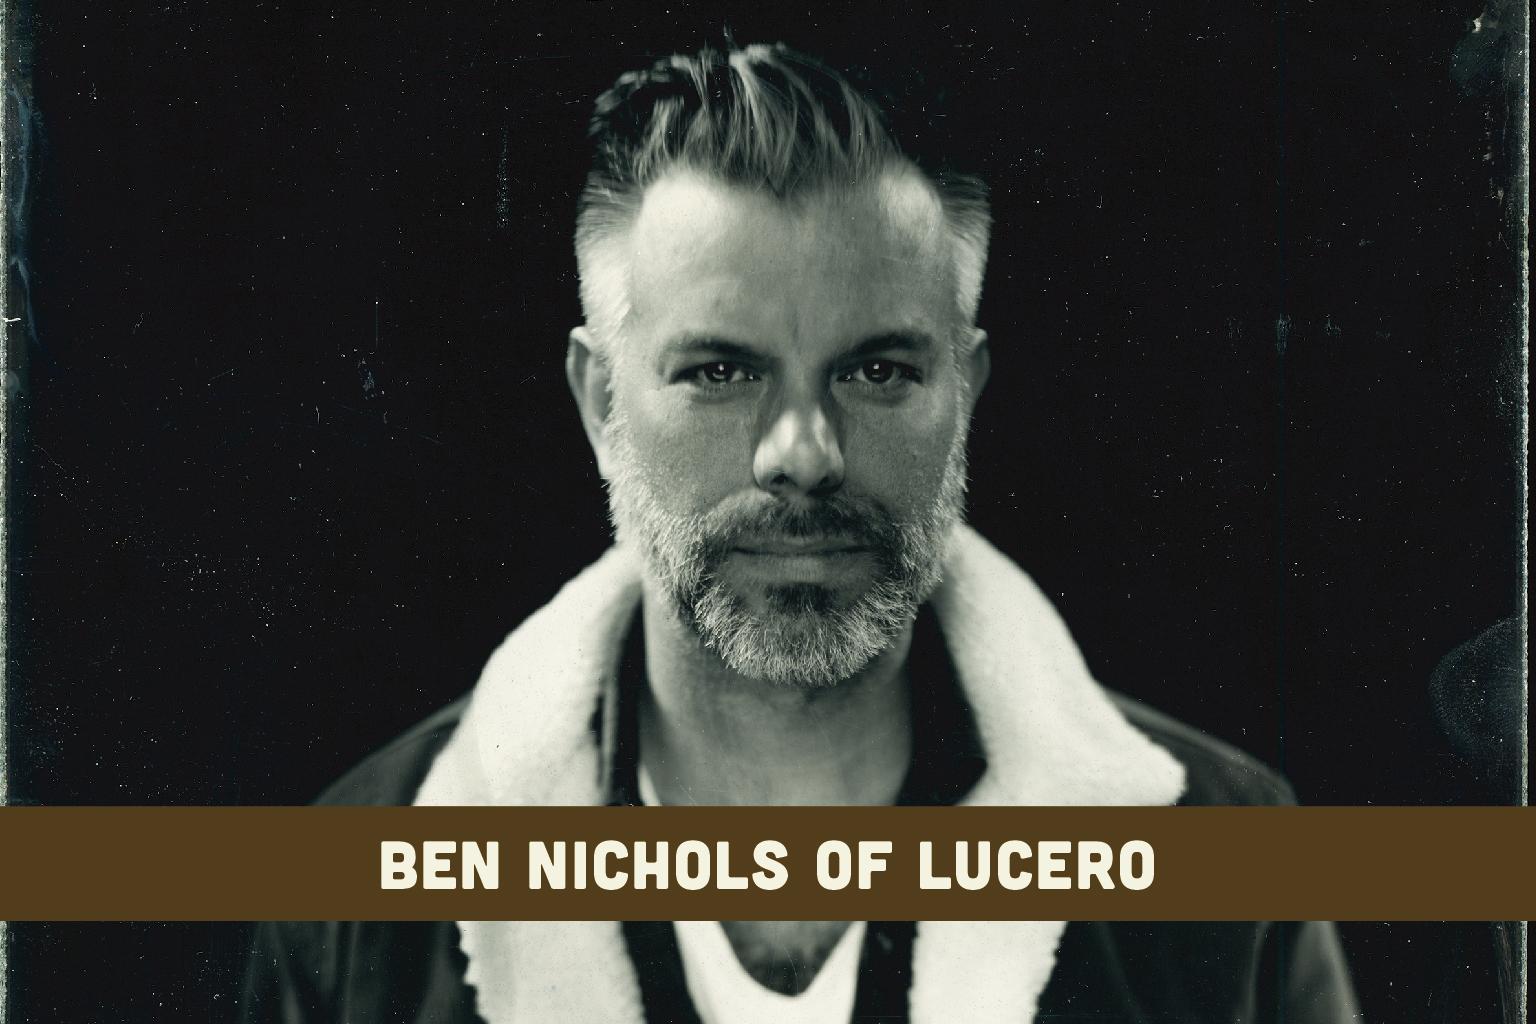 Ben Nichols of Lucero